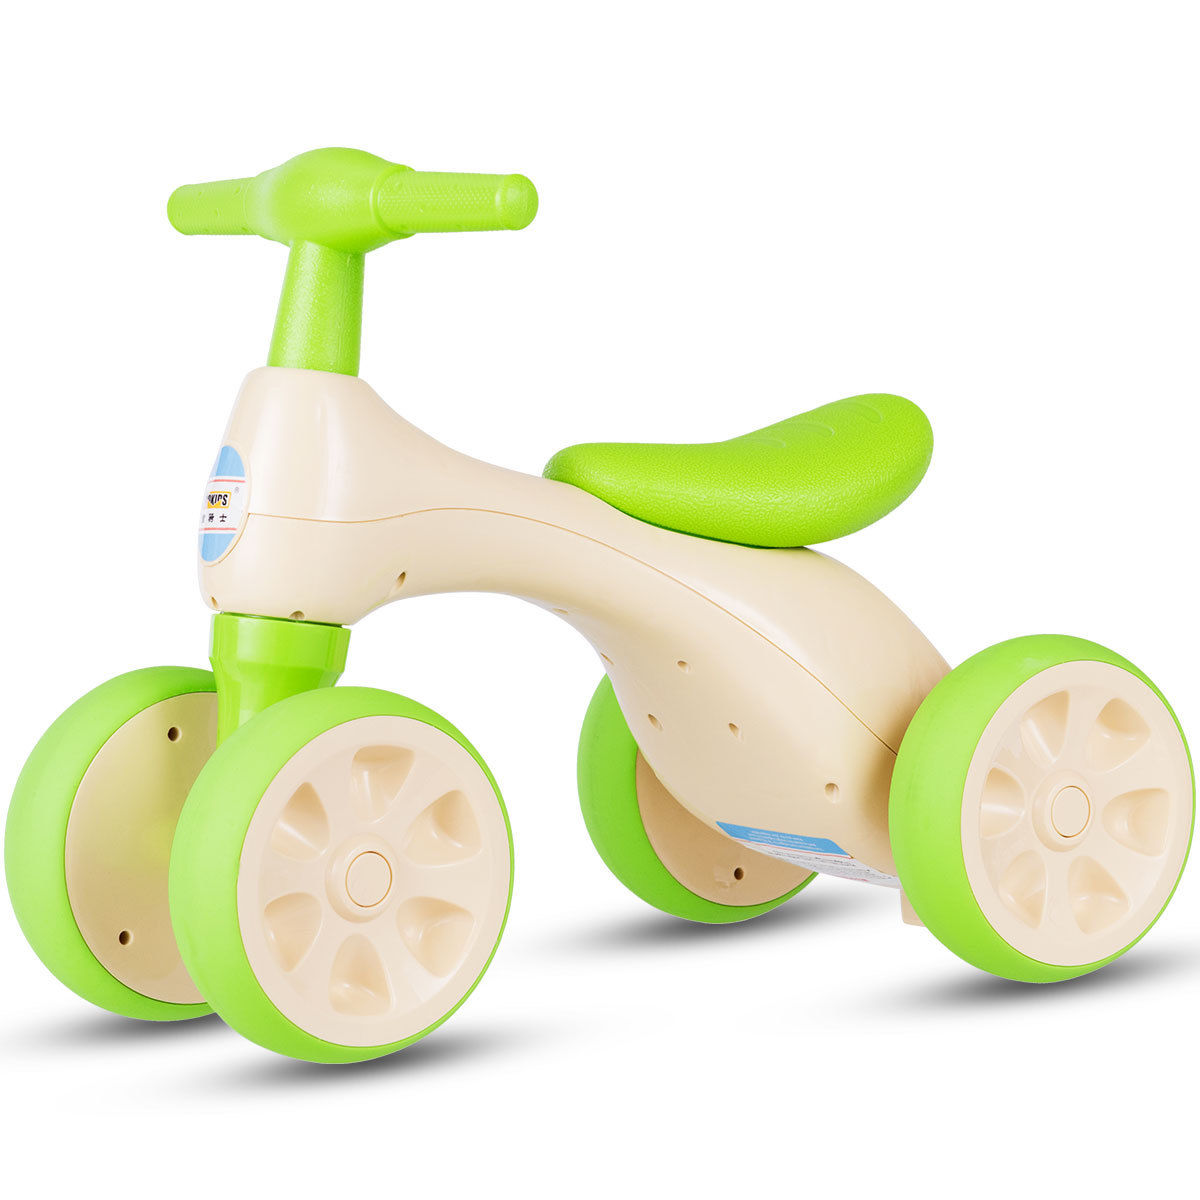 Costway Baby Balance Bike No Pedal Bicycle Children Walker 4 Wheels w/ Sound & Storage - image 10 de 10